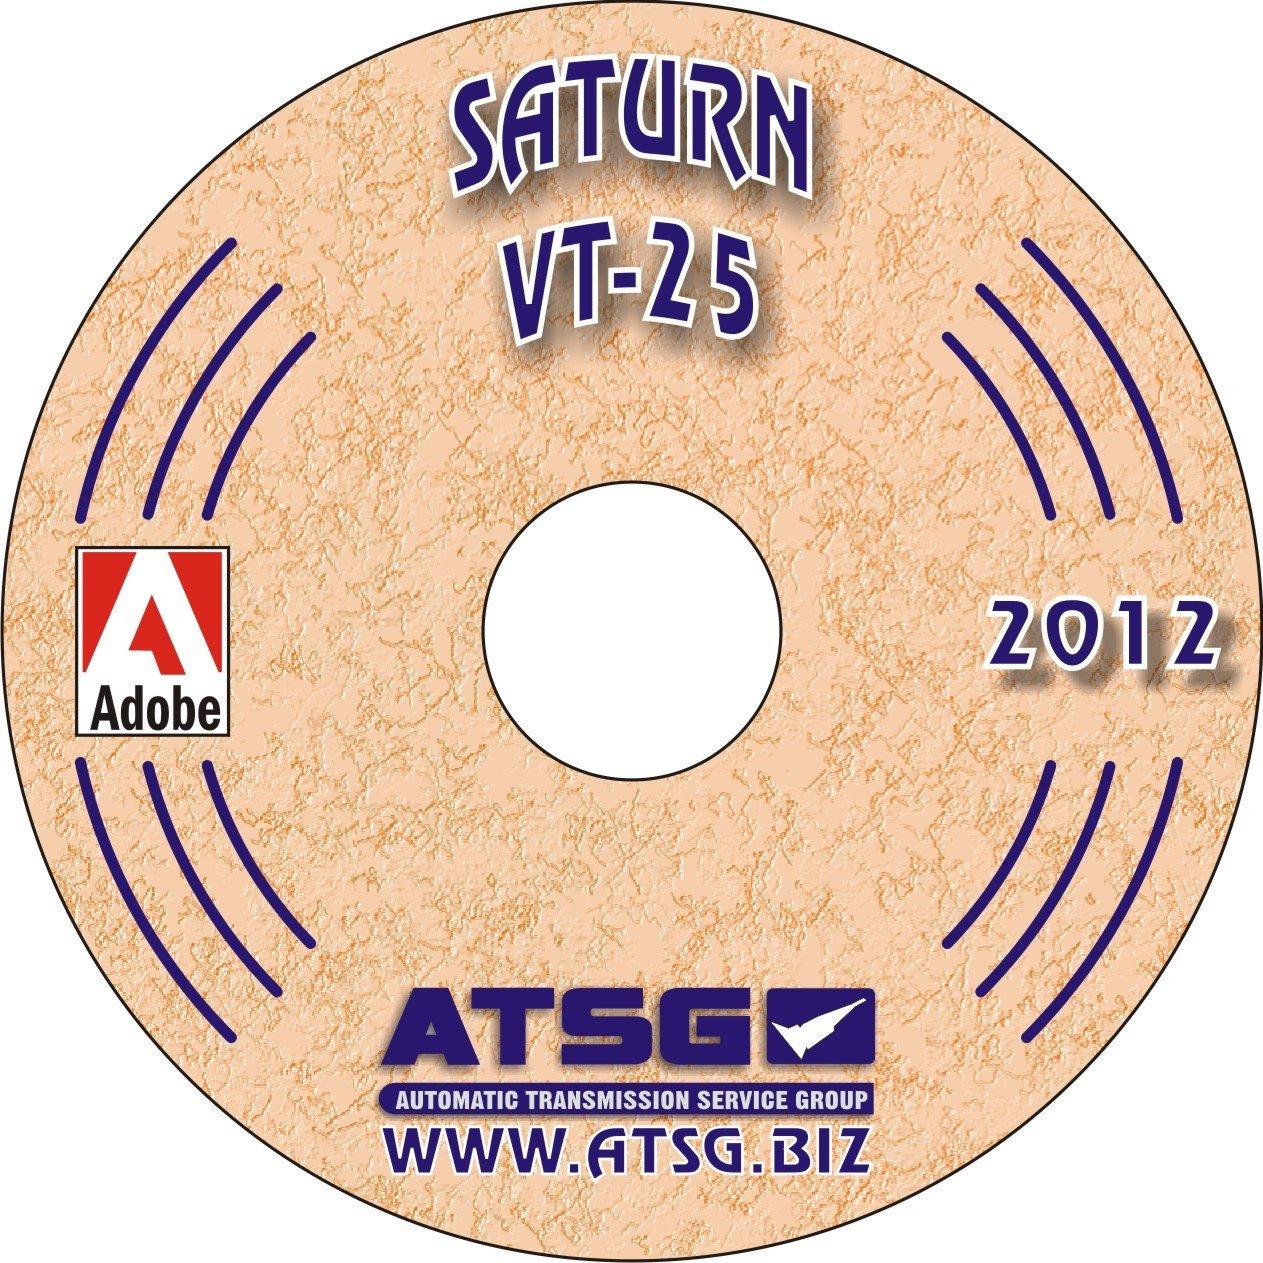 ATSG Saturn VT25-E/VT20-E Techtran Transmission Rebuild Manual: Automatic  Transmission Service Group: Amazon.com: Books